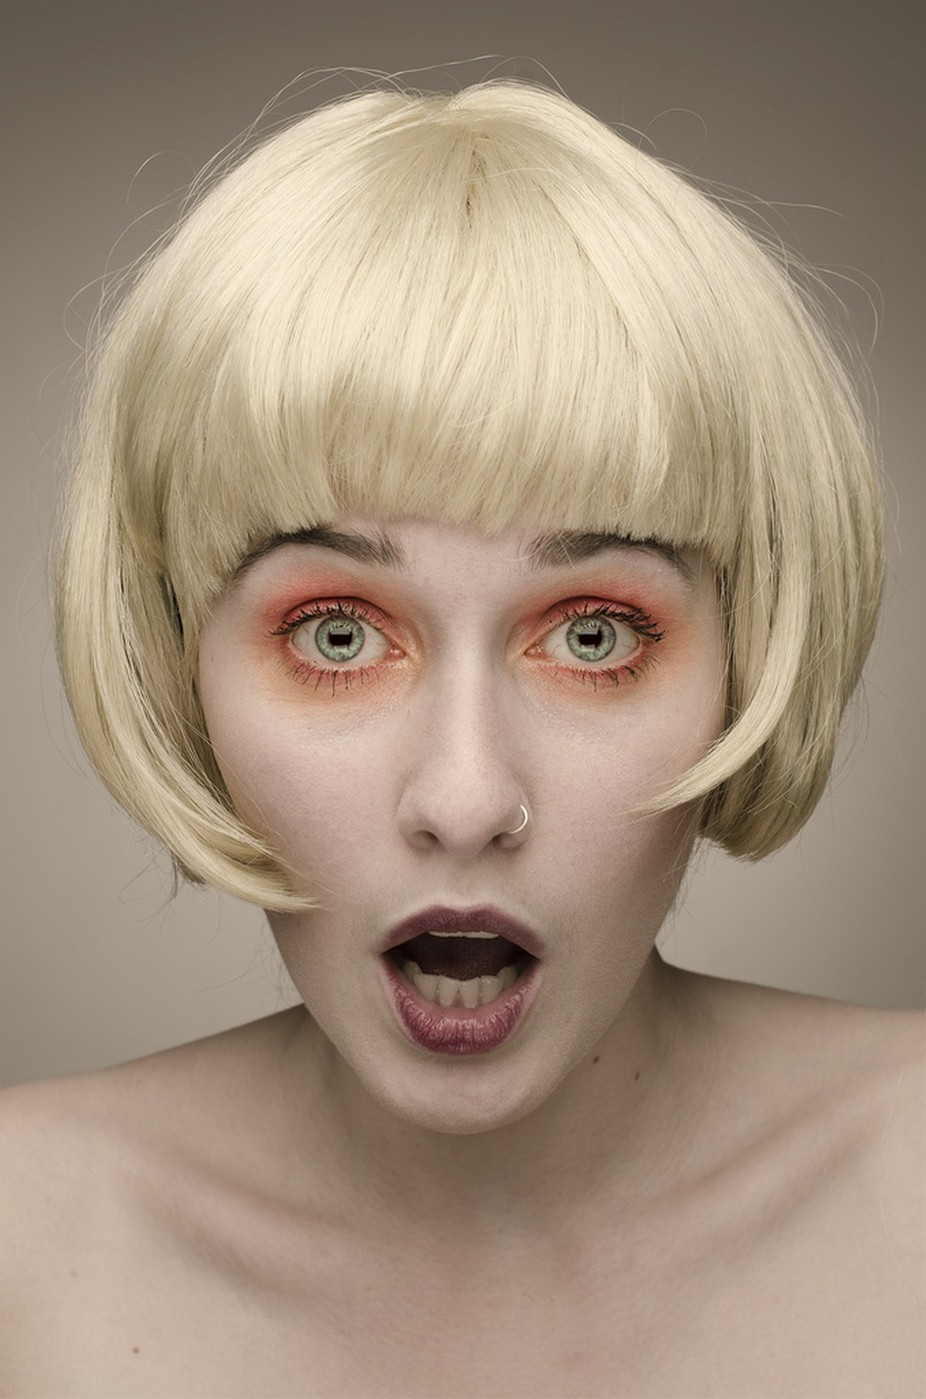 eyes-trait by javiroman - Distinctive Expressions Photo Contest